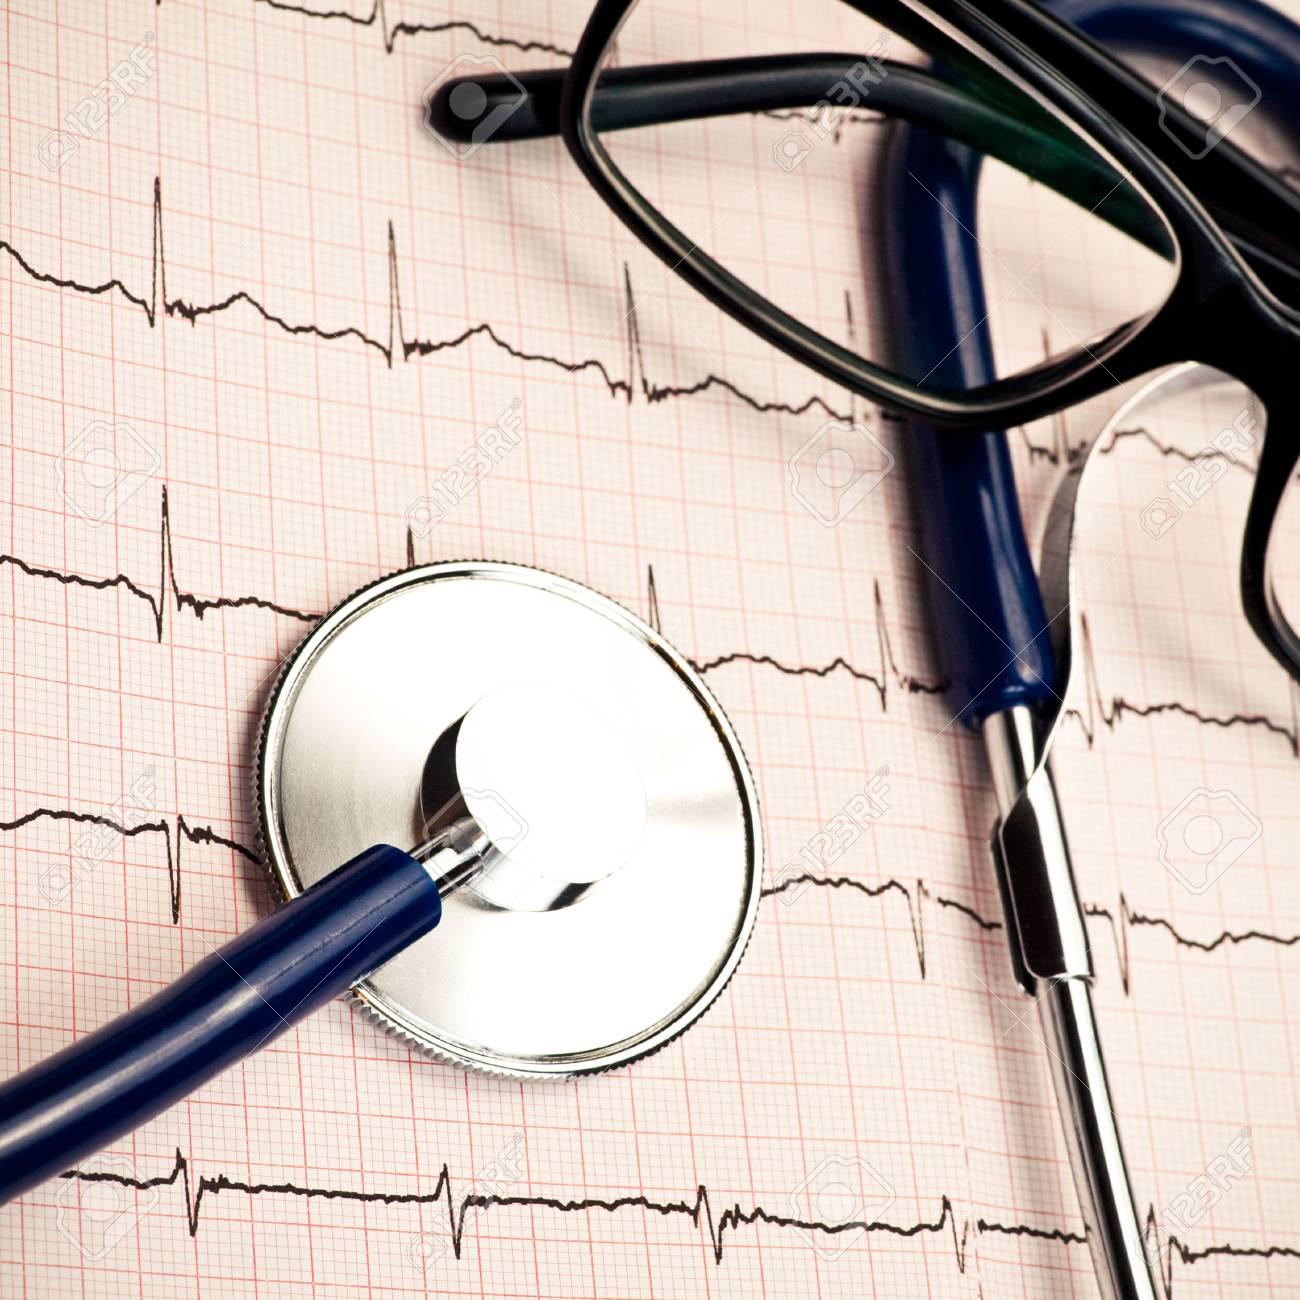 Stethoscope and glasses lying on ECG diagram Stock Photo - 5277296